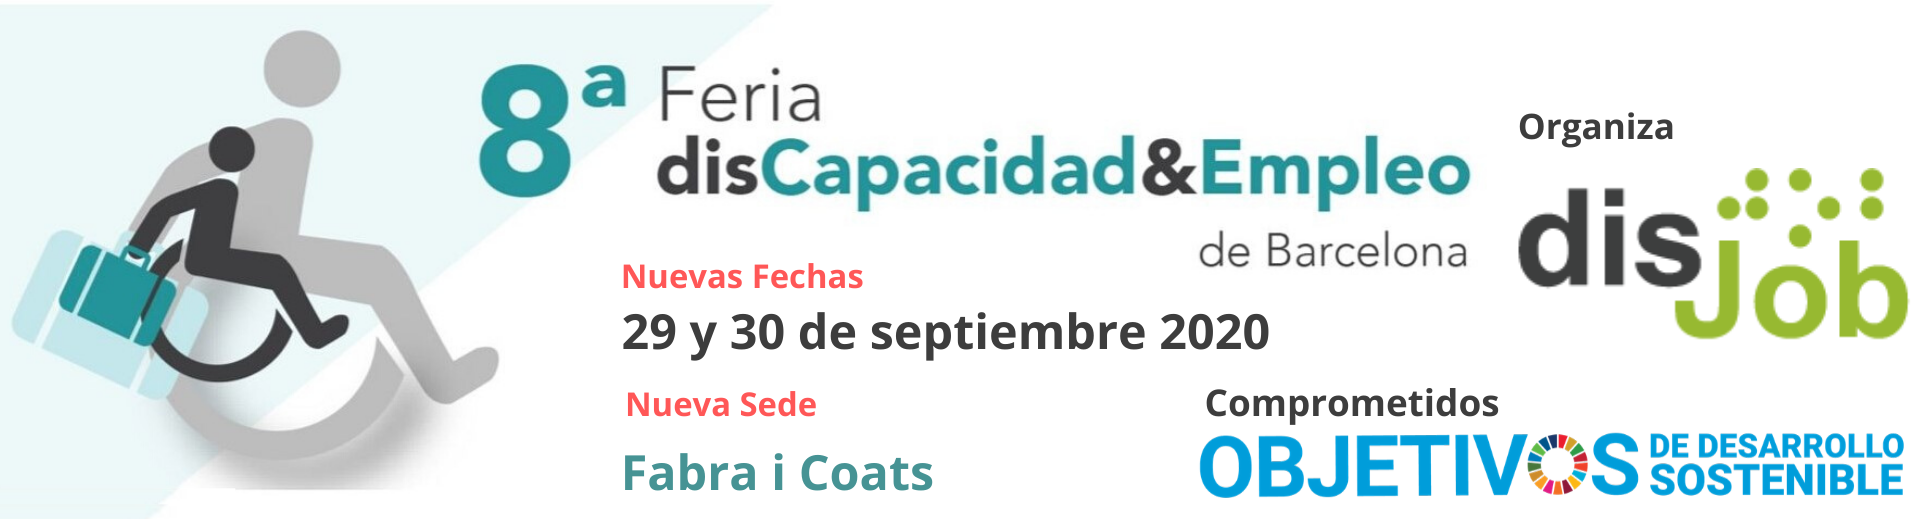 8ª Feria disCapacidad&Empleo de Barcelona